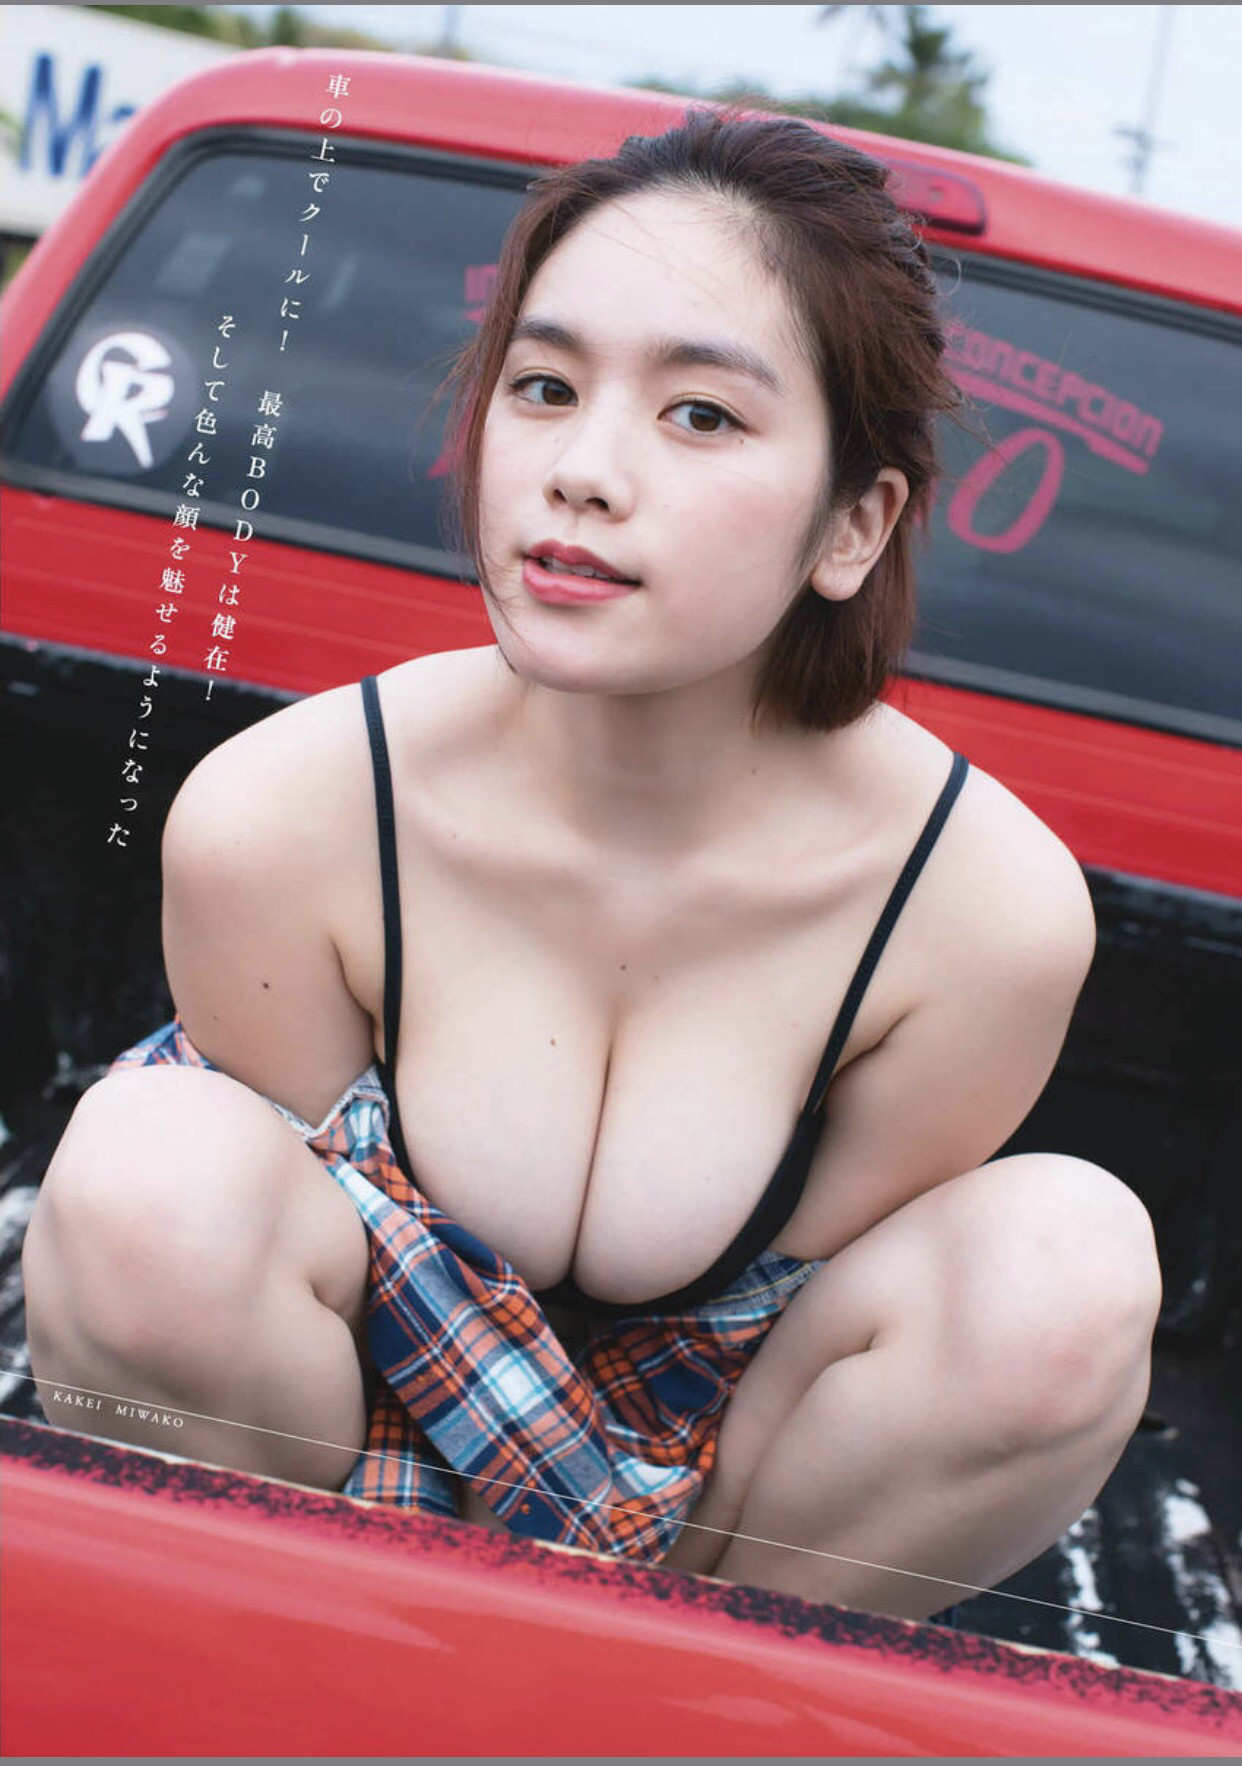 【おっぱいネキ】筧美和子さんの乳輪を隠す為の二プレスのサイズwwwwwwwwwwwwwwwwwwwwwwwww(画像あり)・23枚目